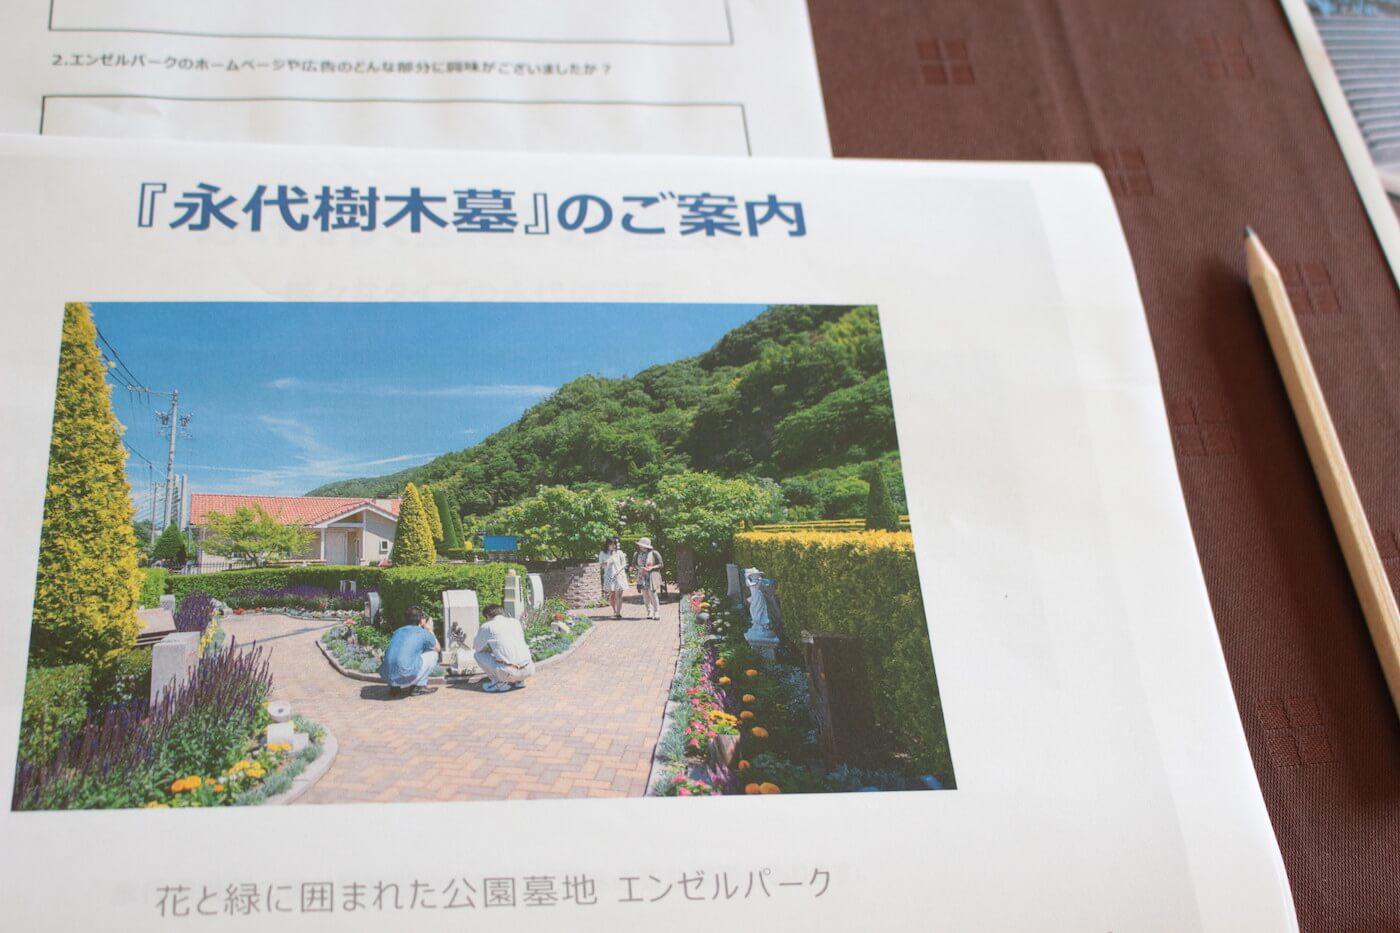 【開催レポート】永代樹木墓と合同供養塔の現地見学会